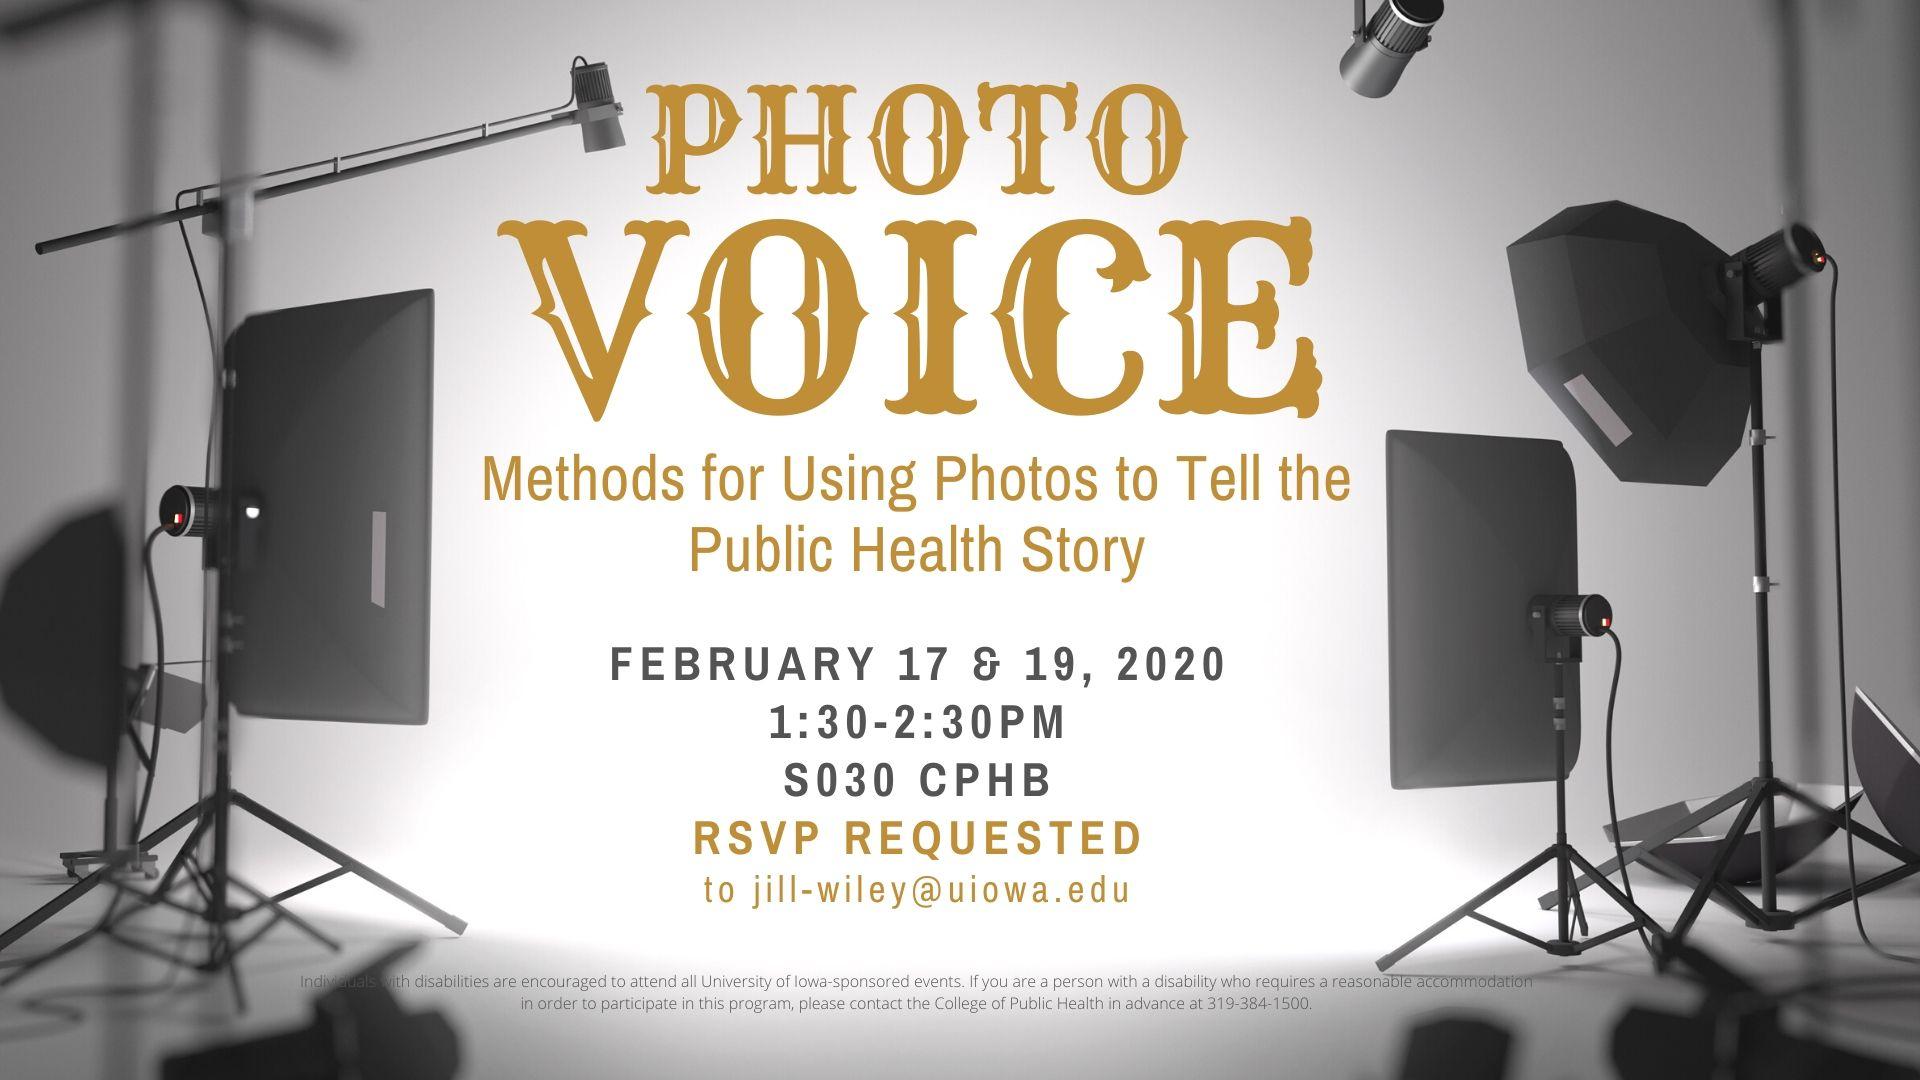 photovoice workshop